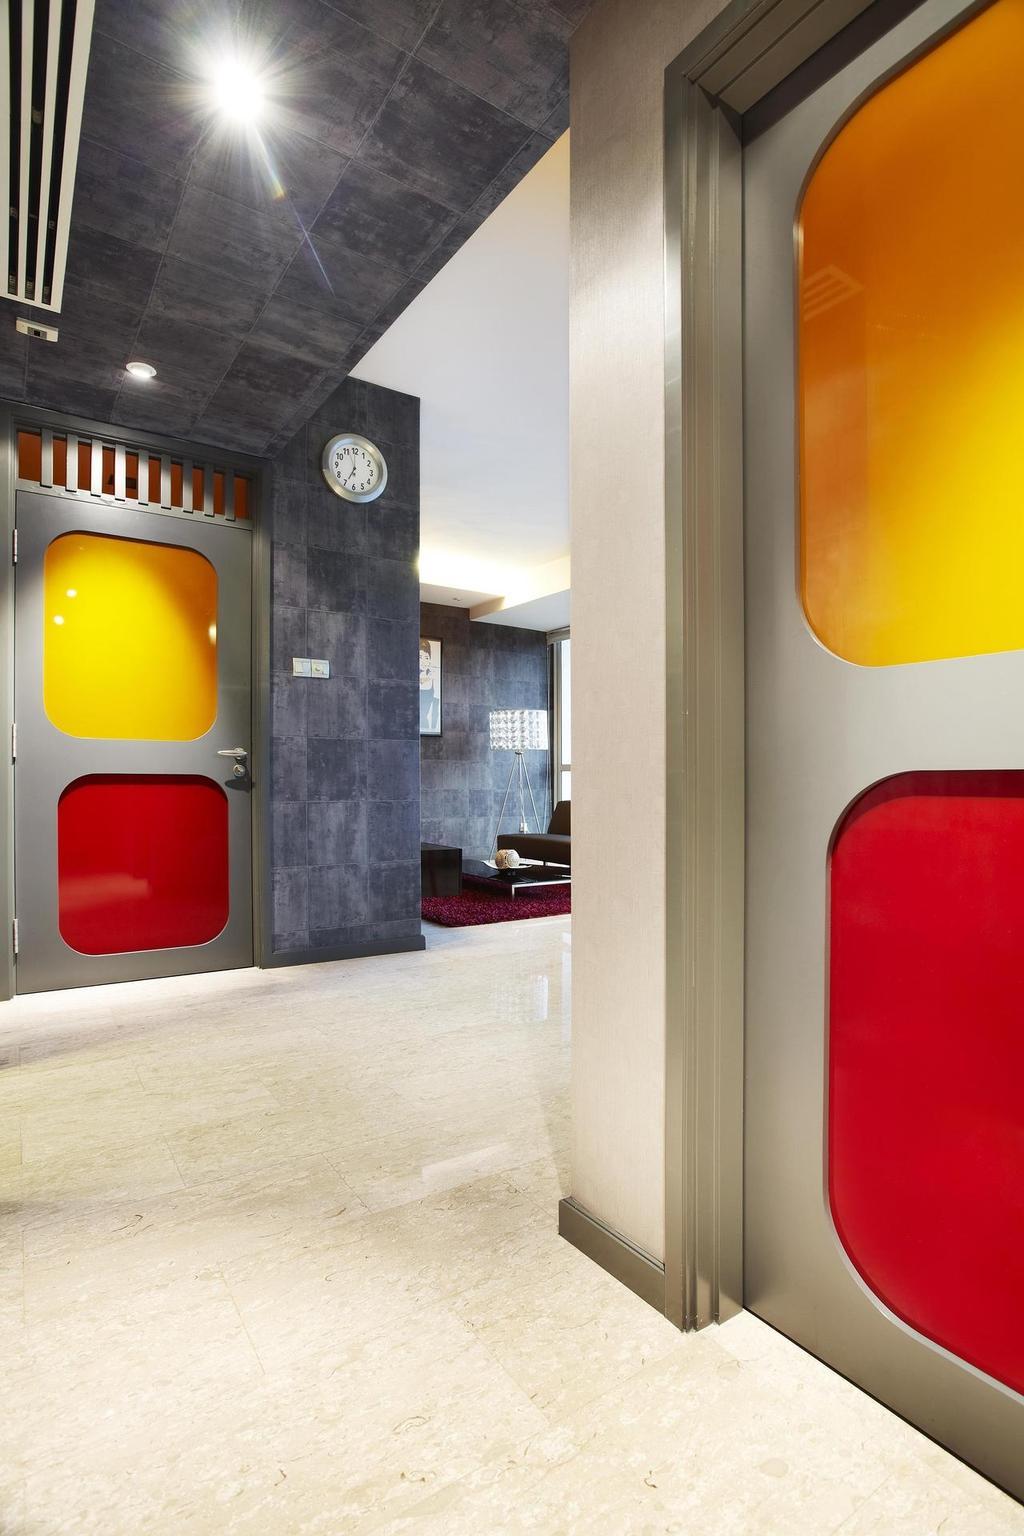 Eclectic, Condo, The Ansley, Interior Designer, Free Space Intent, Doors, Marble Flooring, Gray, Clock, Tile, Tiles, Standing Lamp, White, Metallic, Indoors, Interior Design